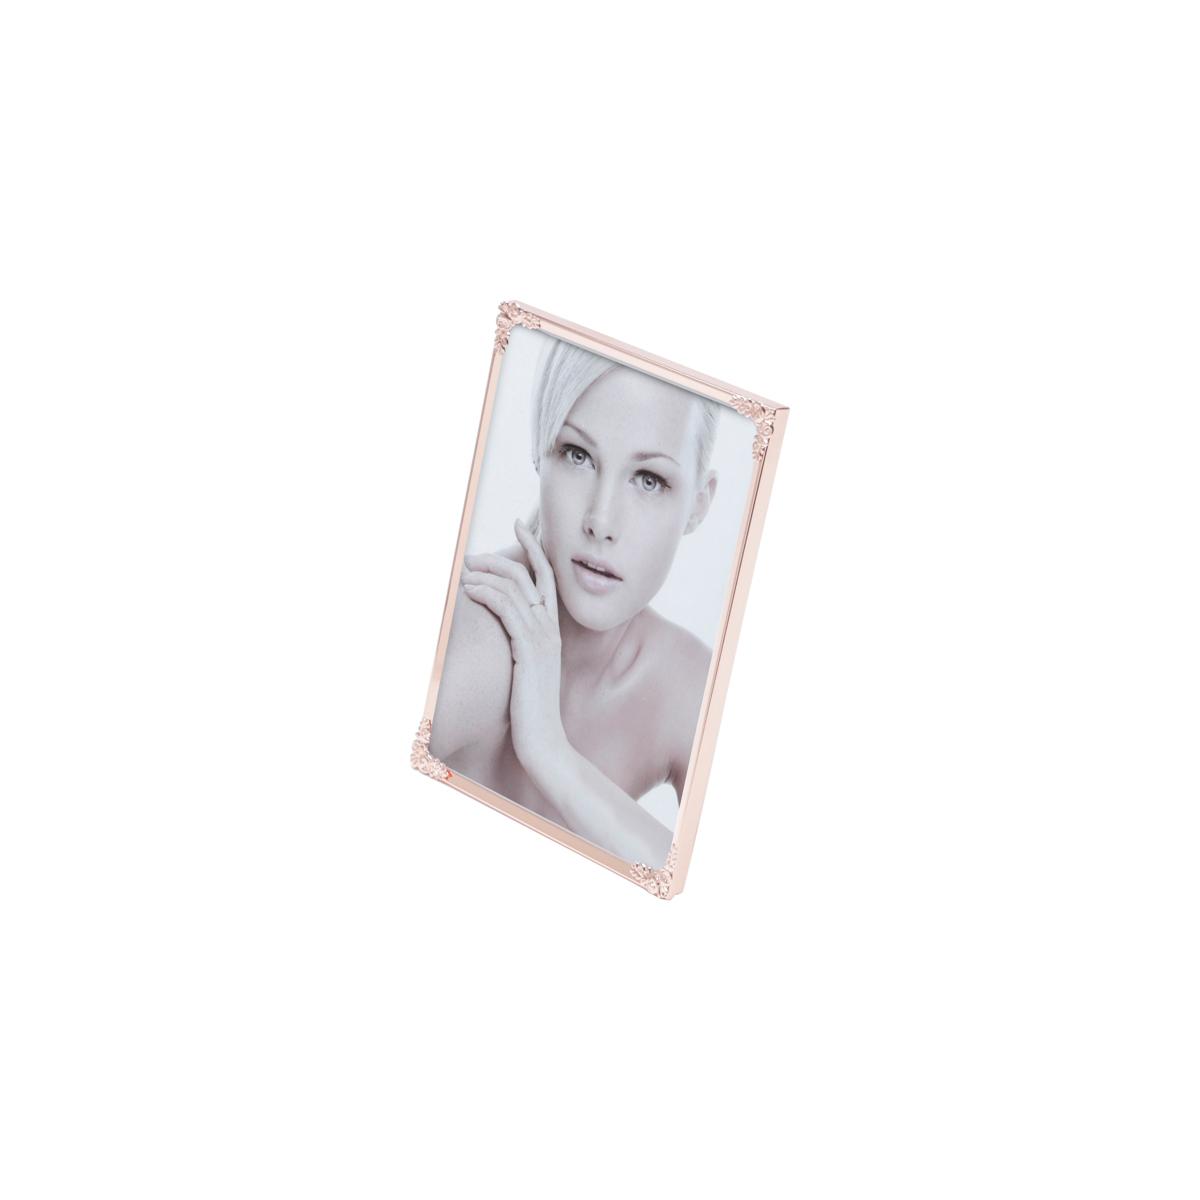 Porta-retrato aco Fleur rose 15,5x20,5cm foto 15x20 Rojemac